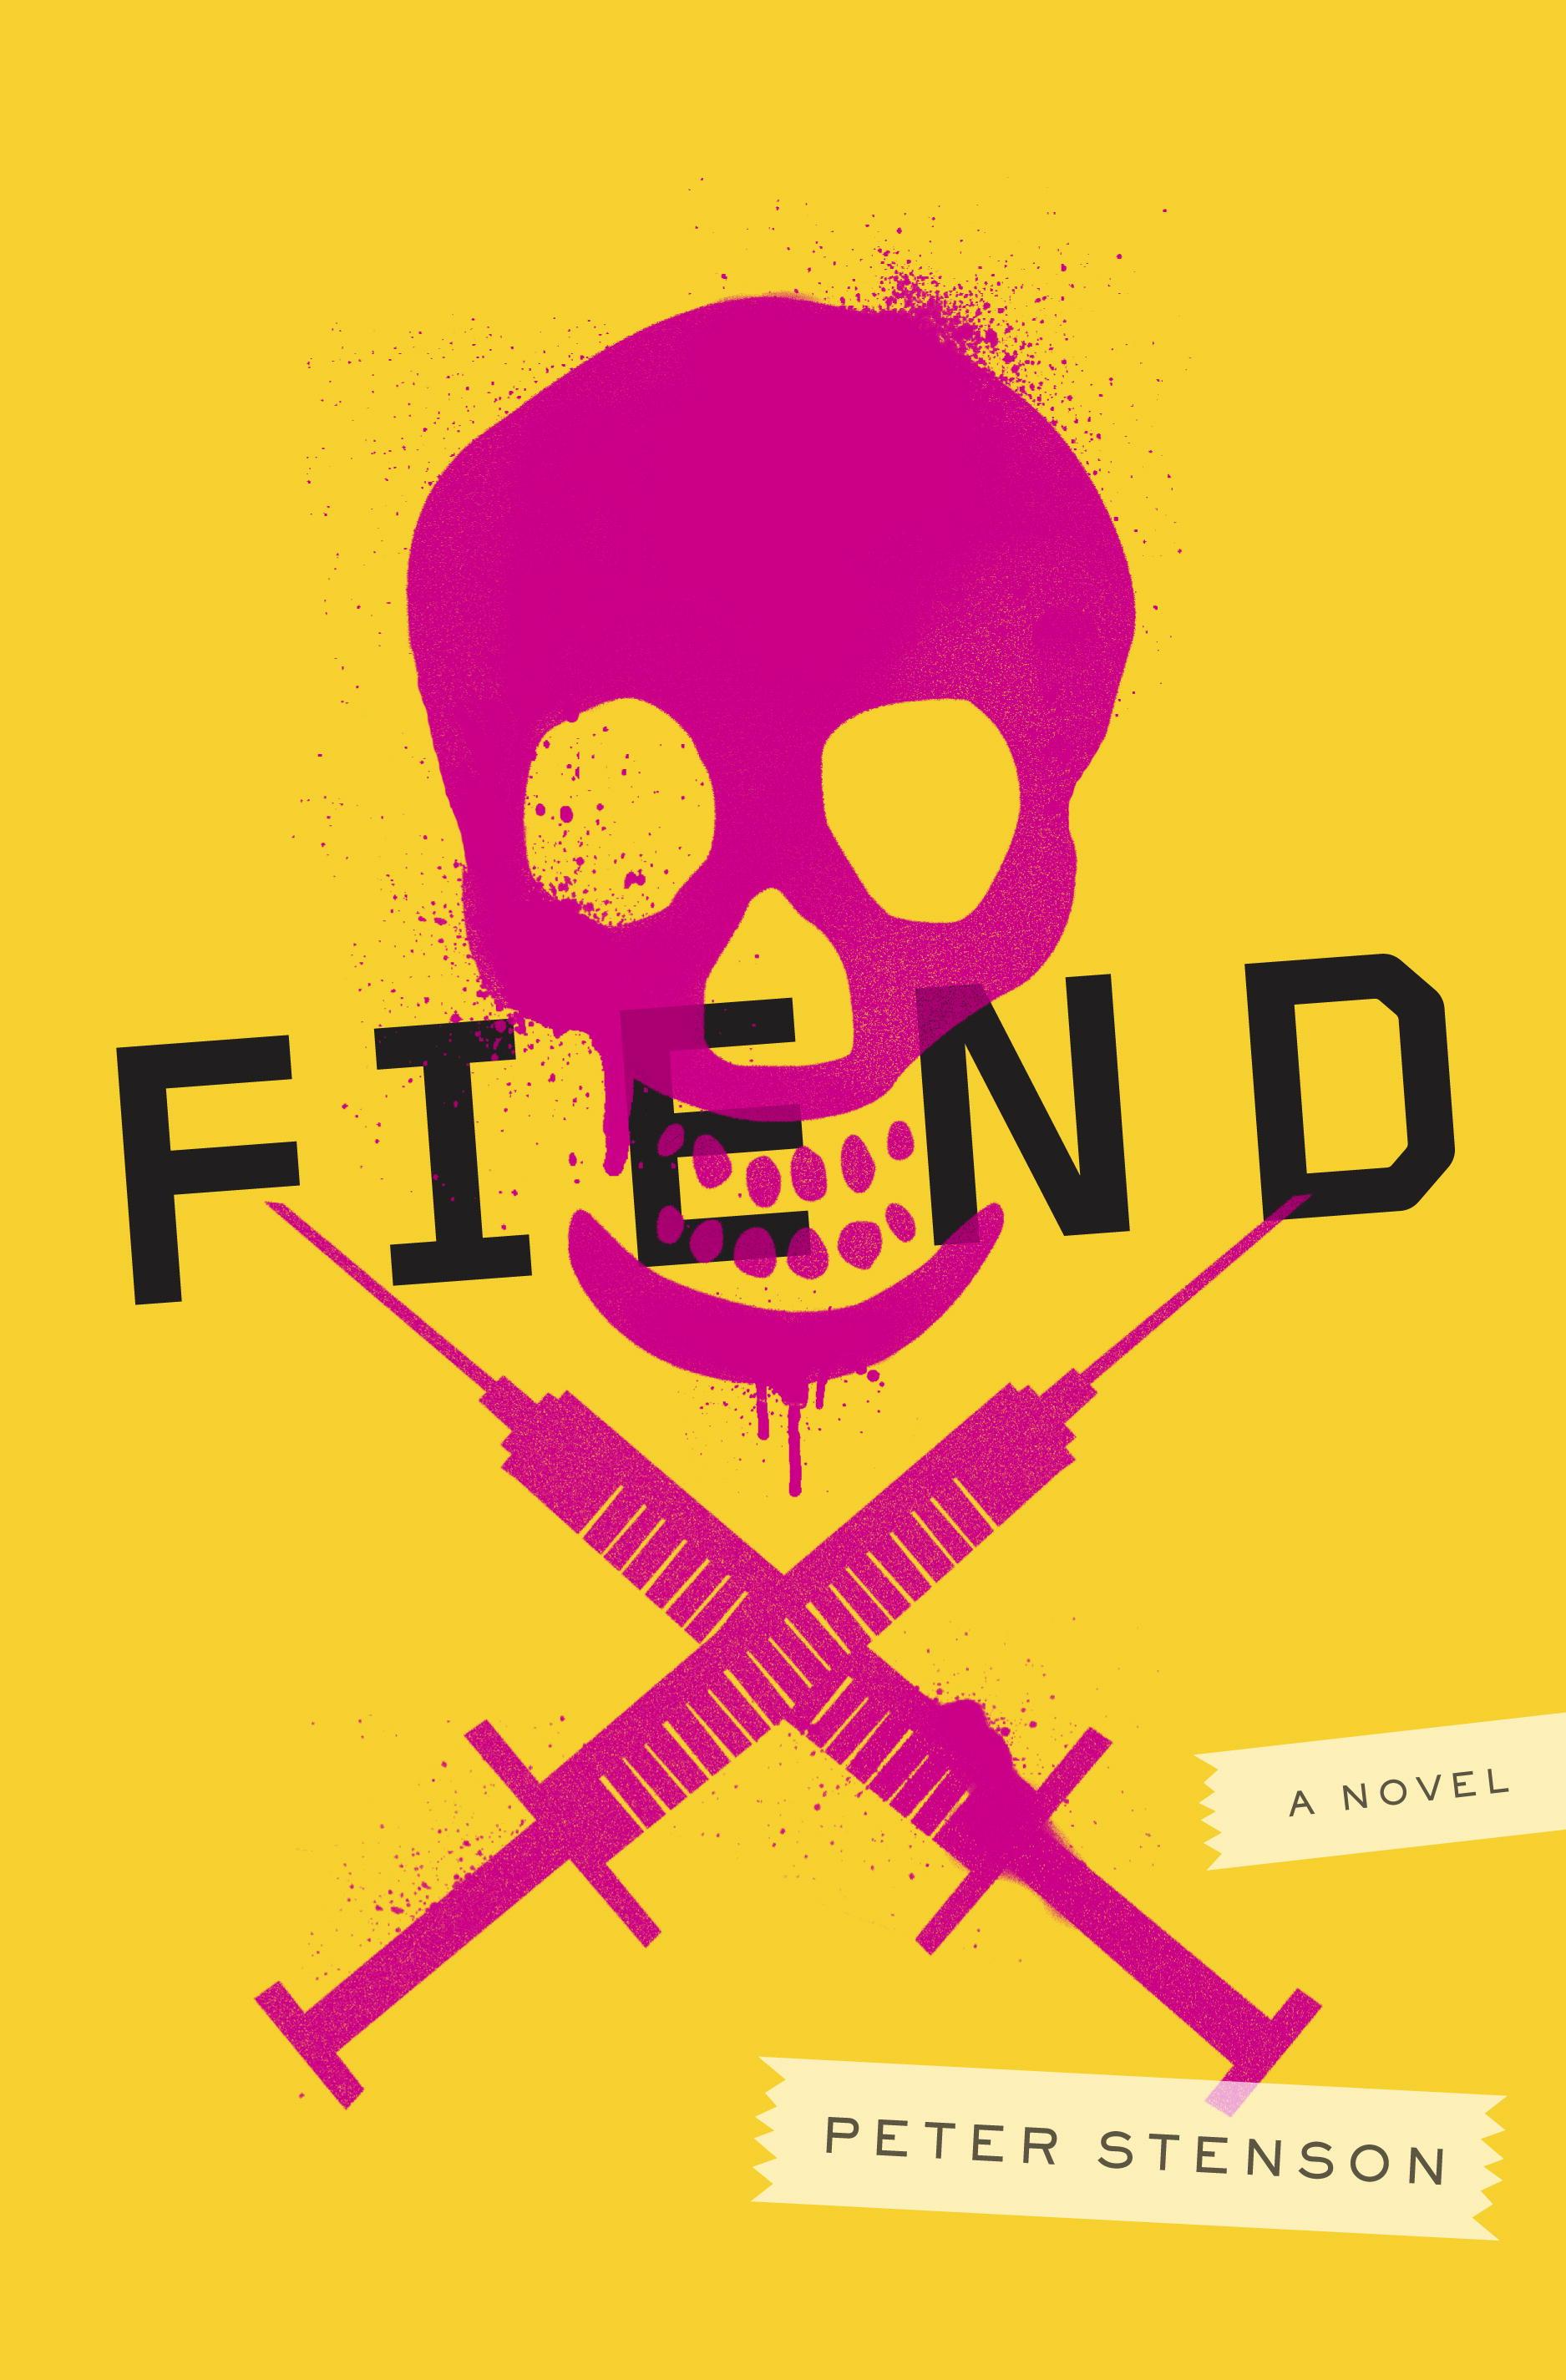 FIEND cover